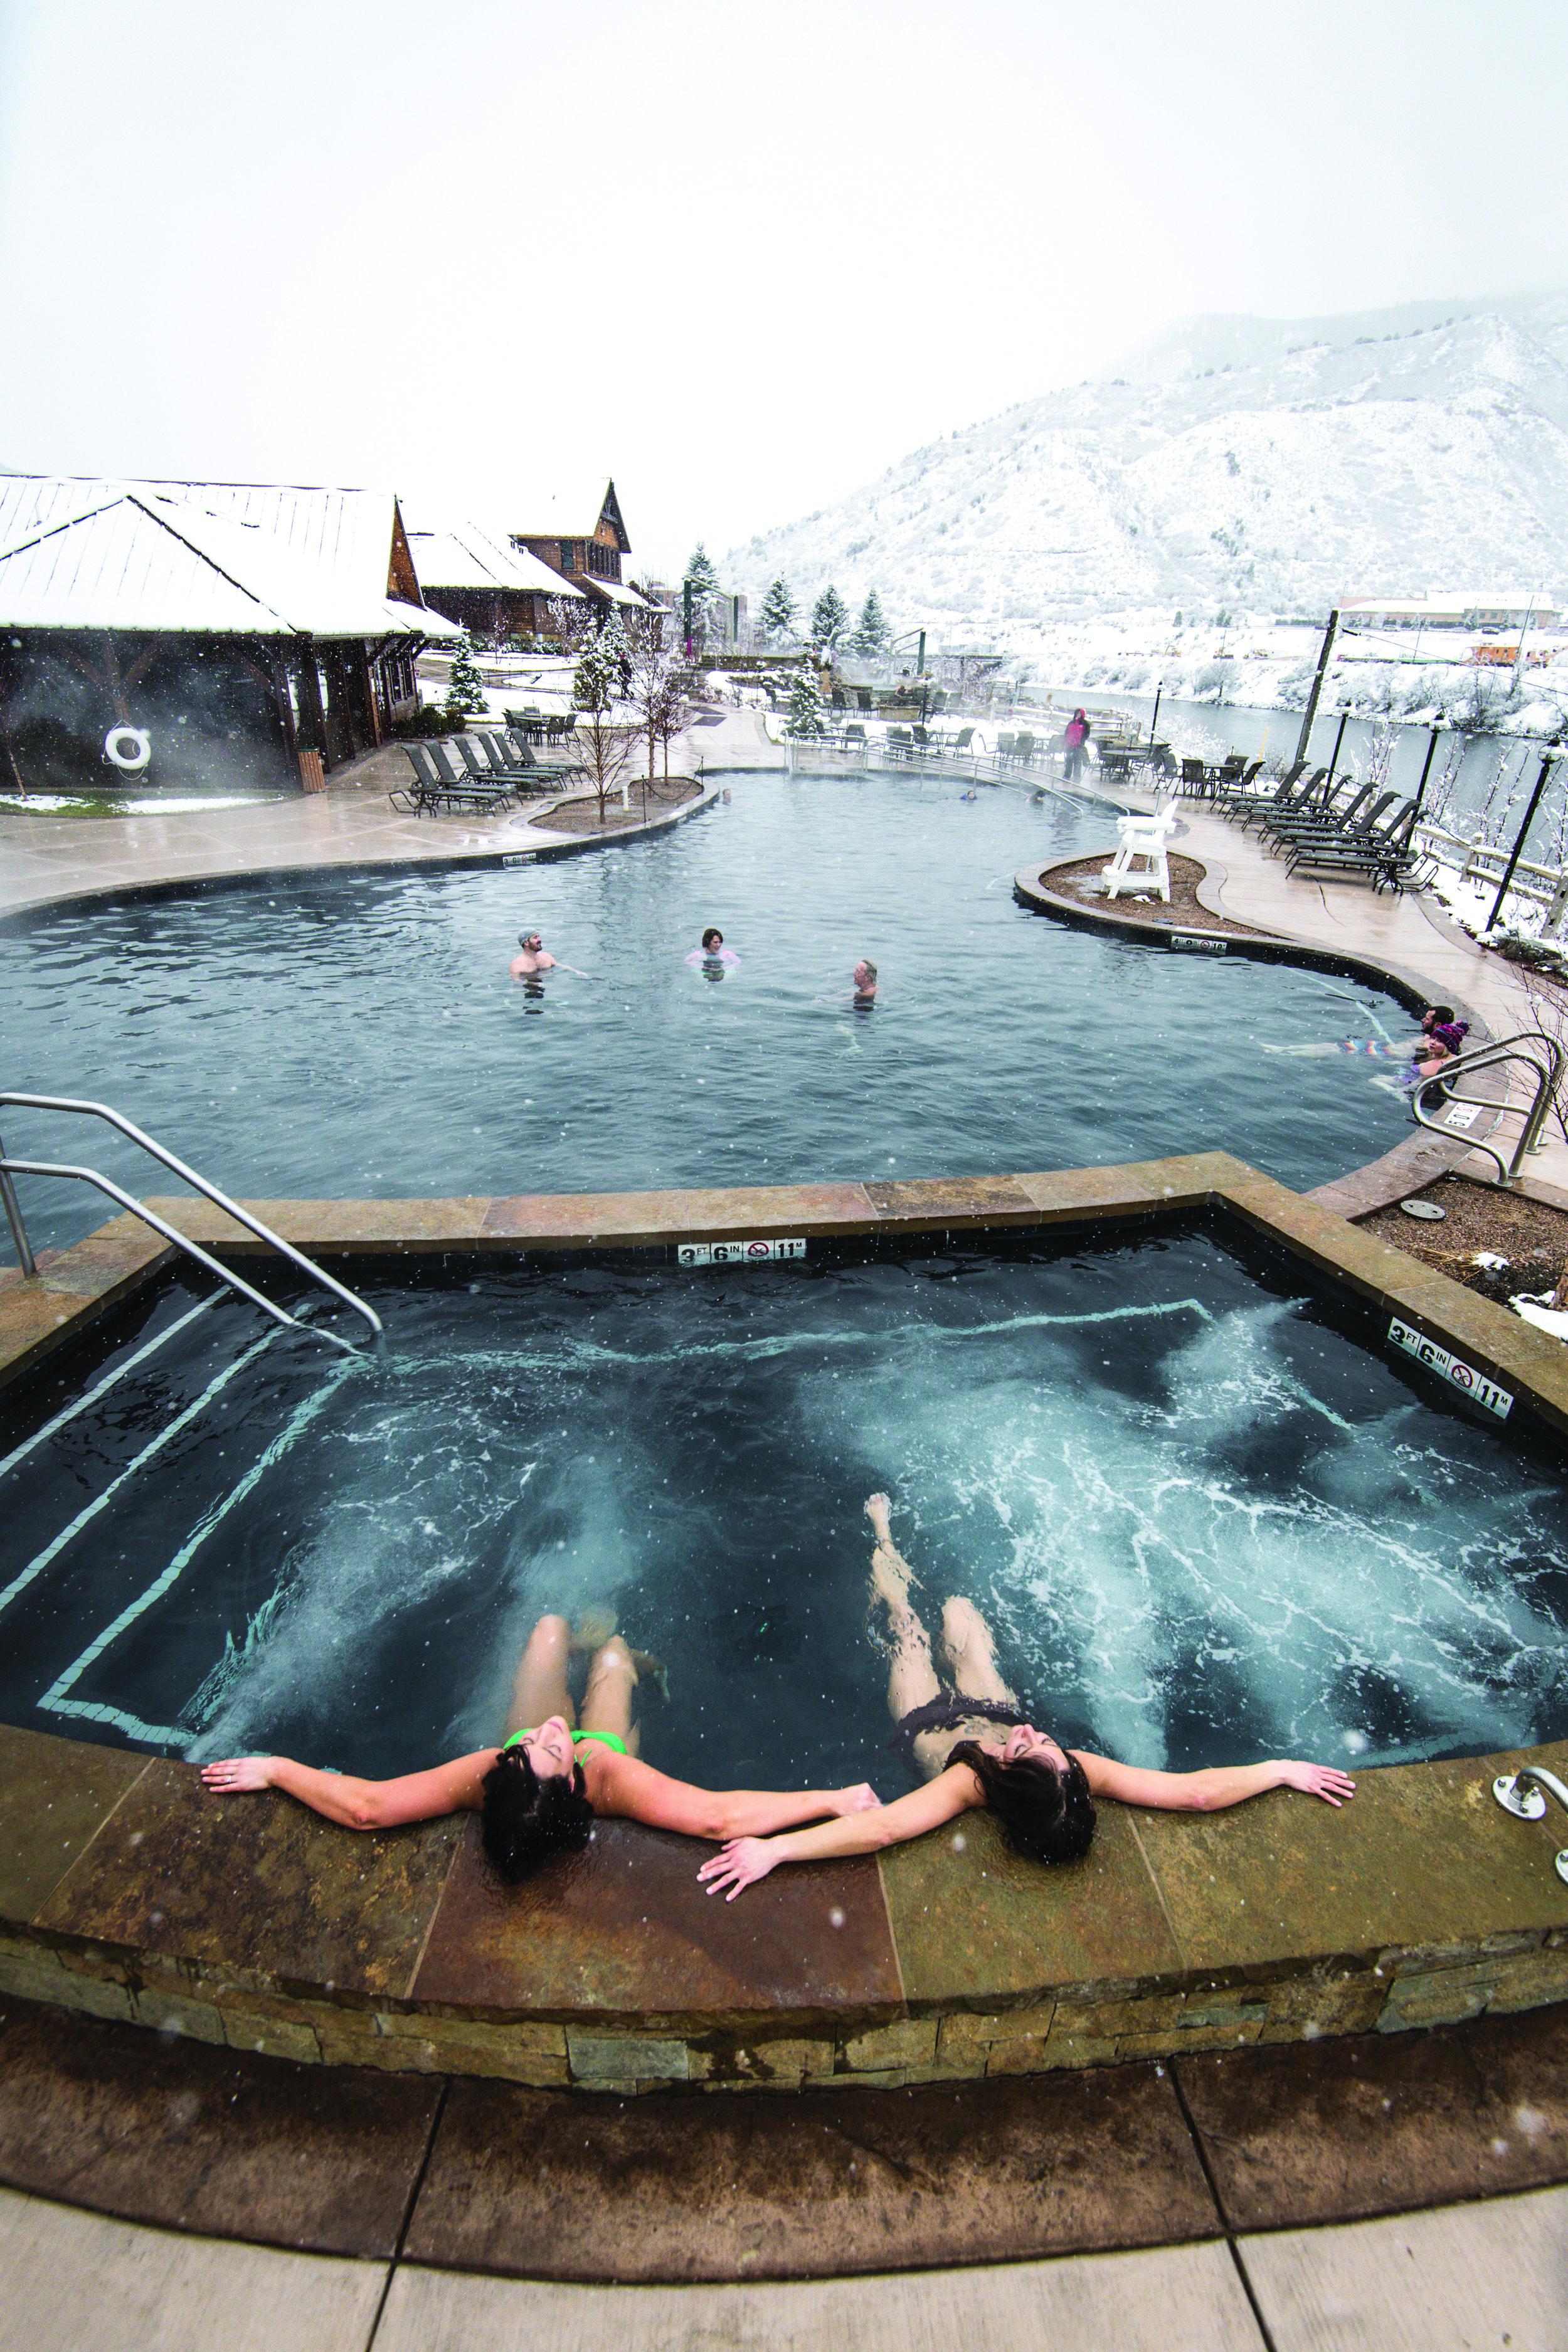 Photo courtesy of Iron Mountain Hot Springs